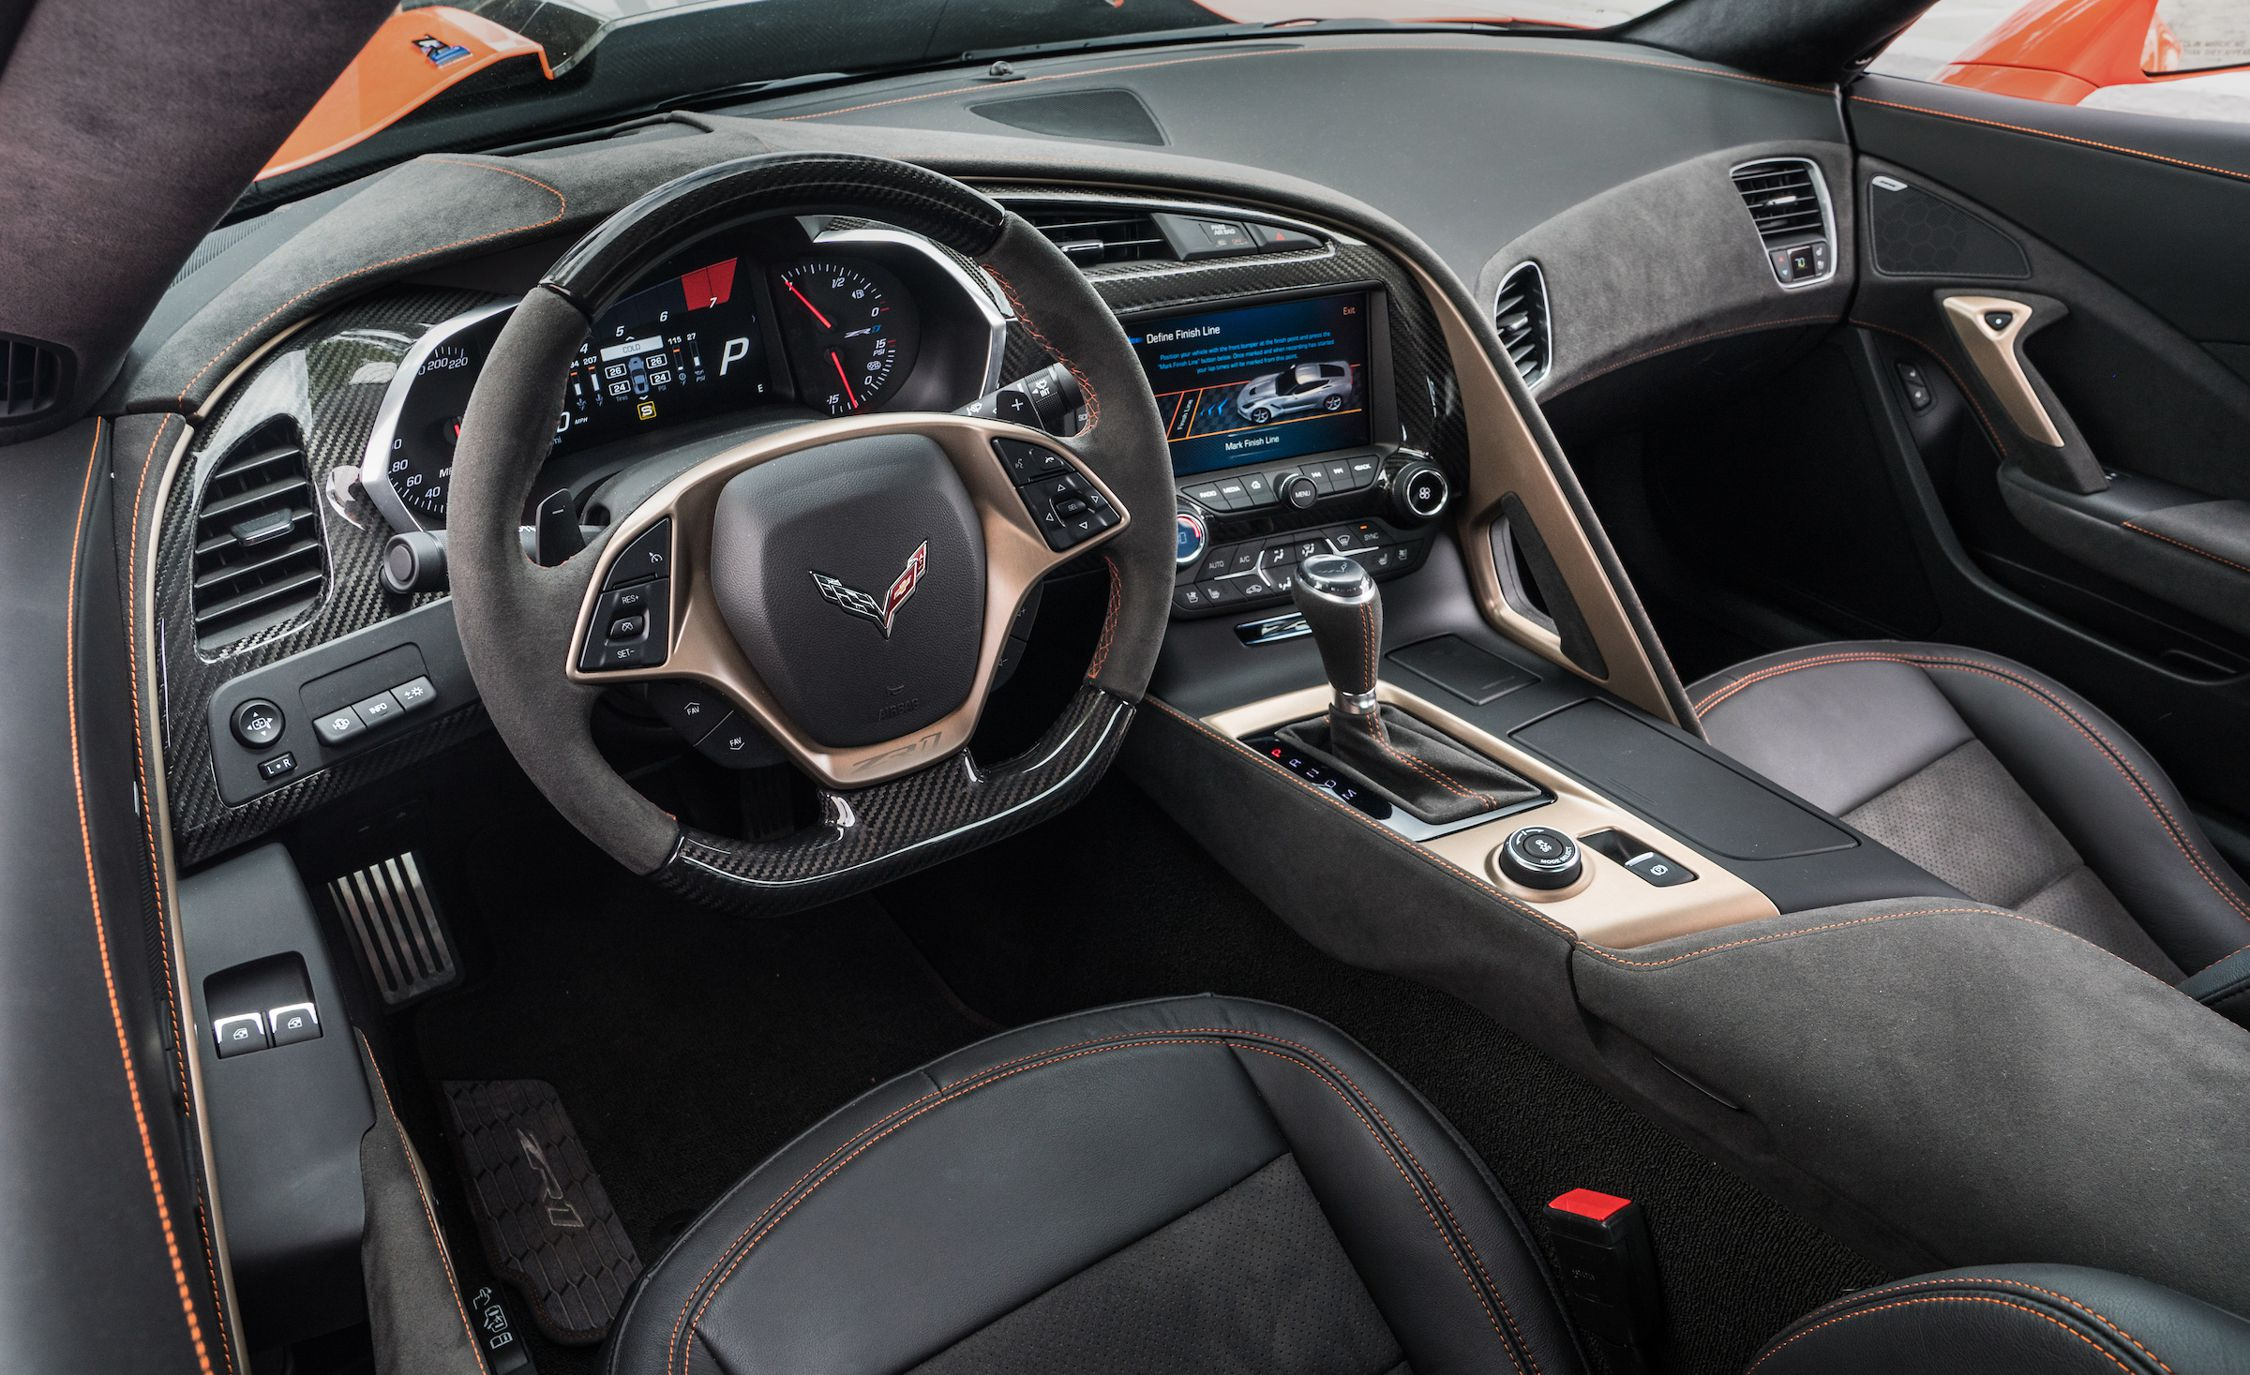 2019 chevrolet corvette zr1 interior cockpit wallpaper